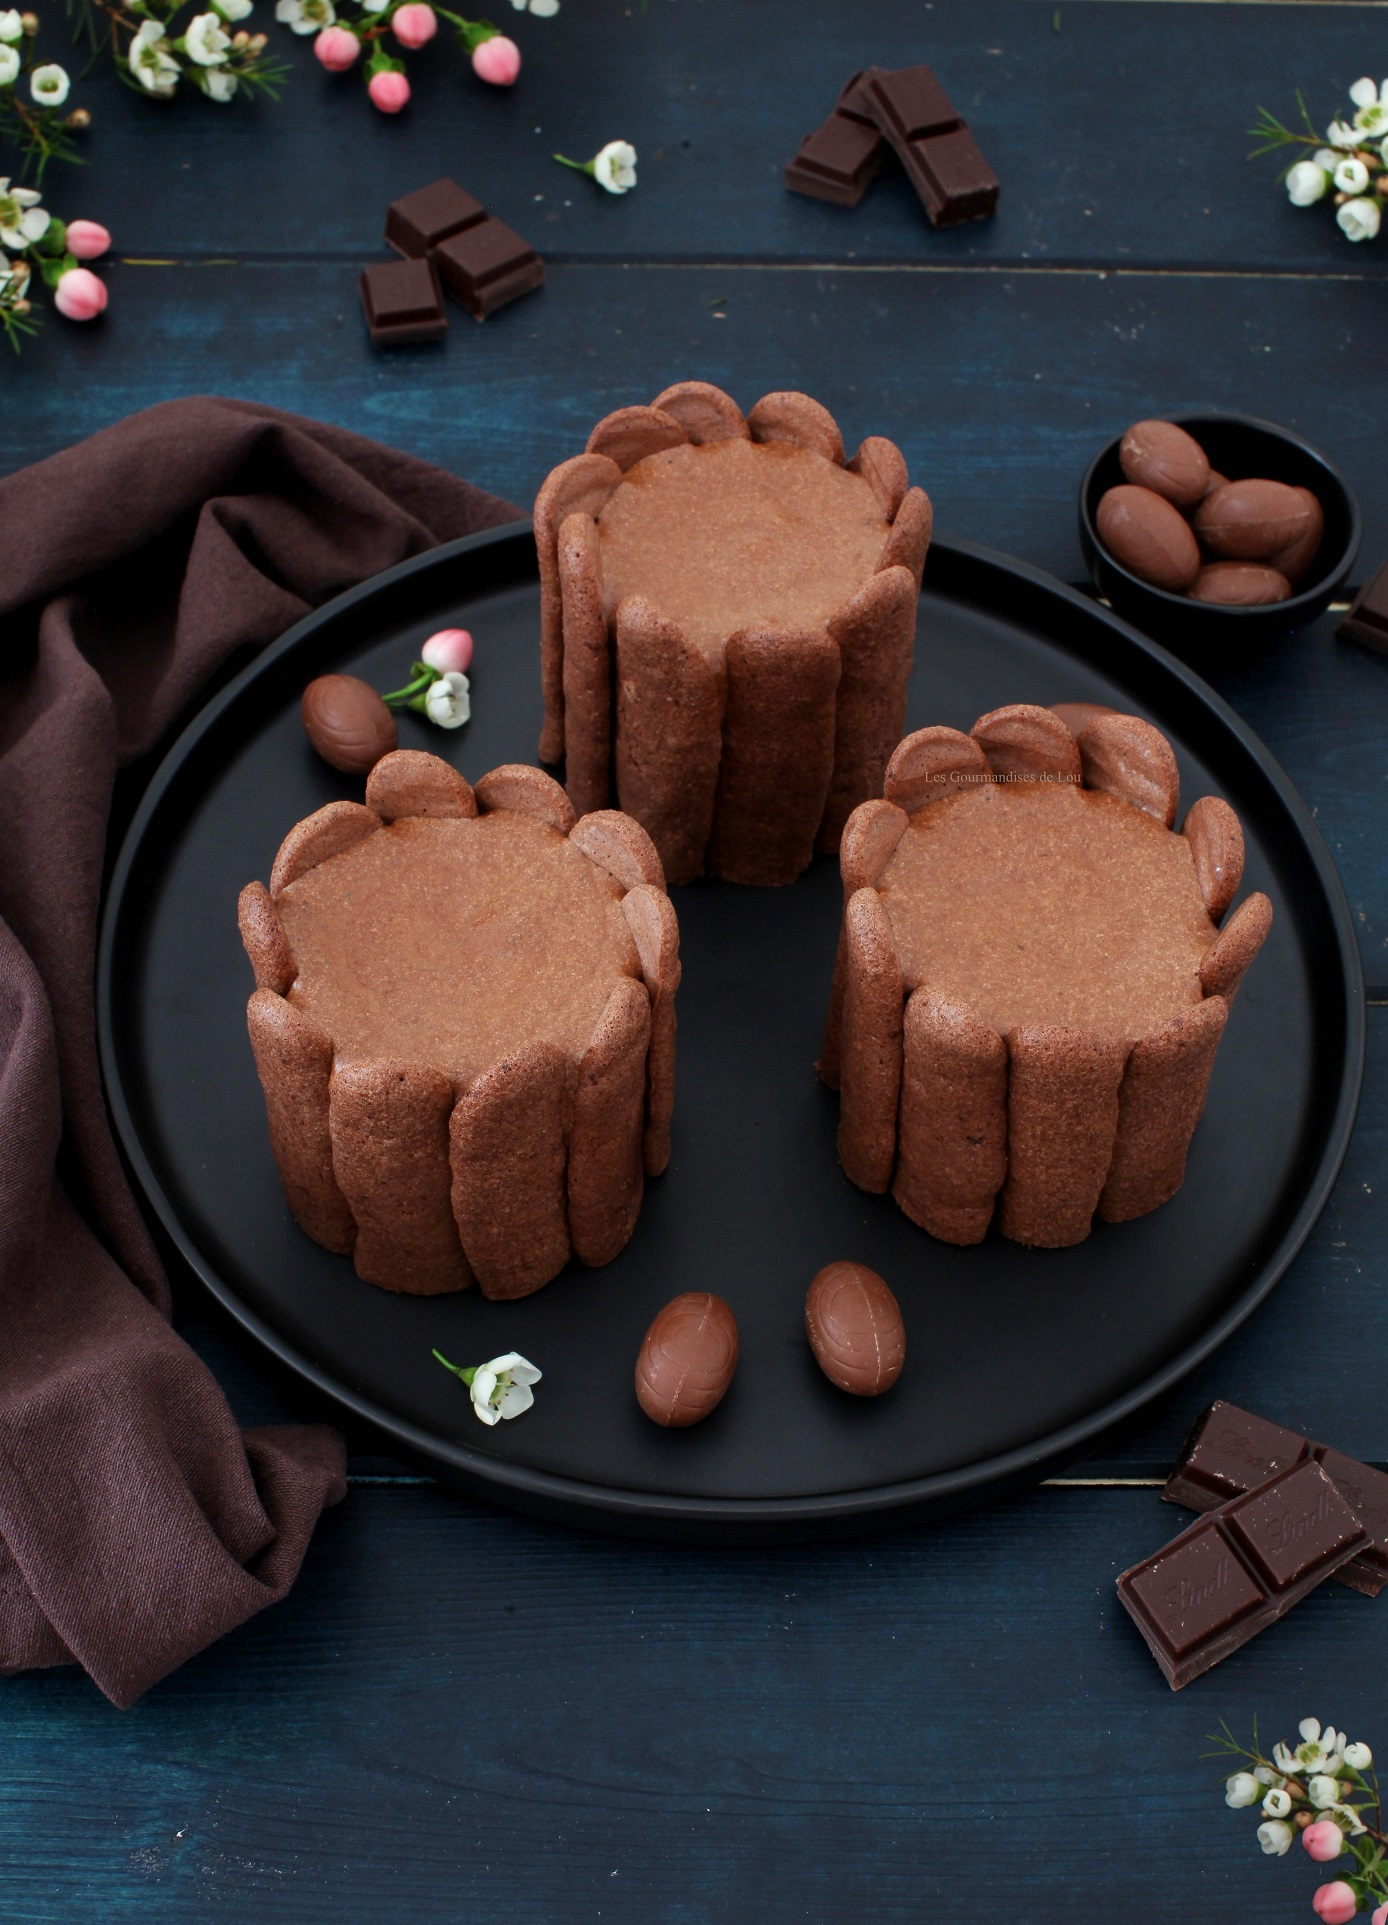 charlottes chocolat noix de coco